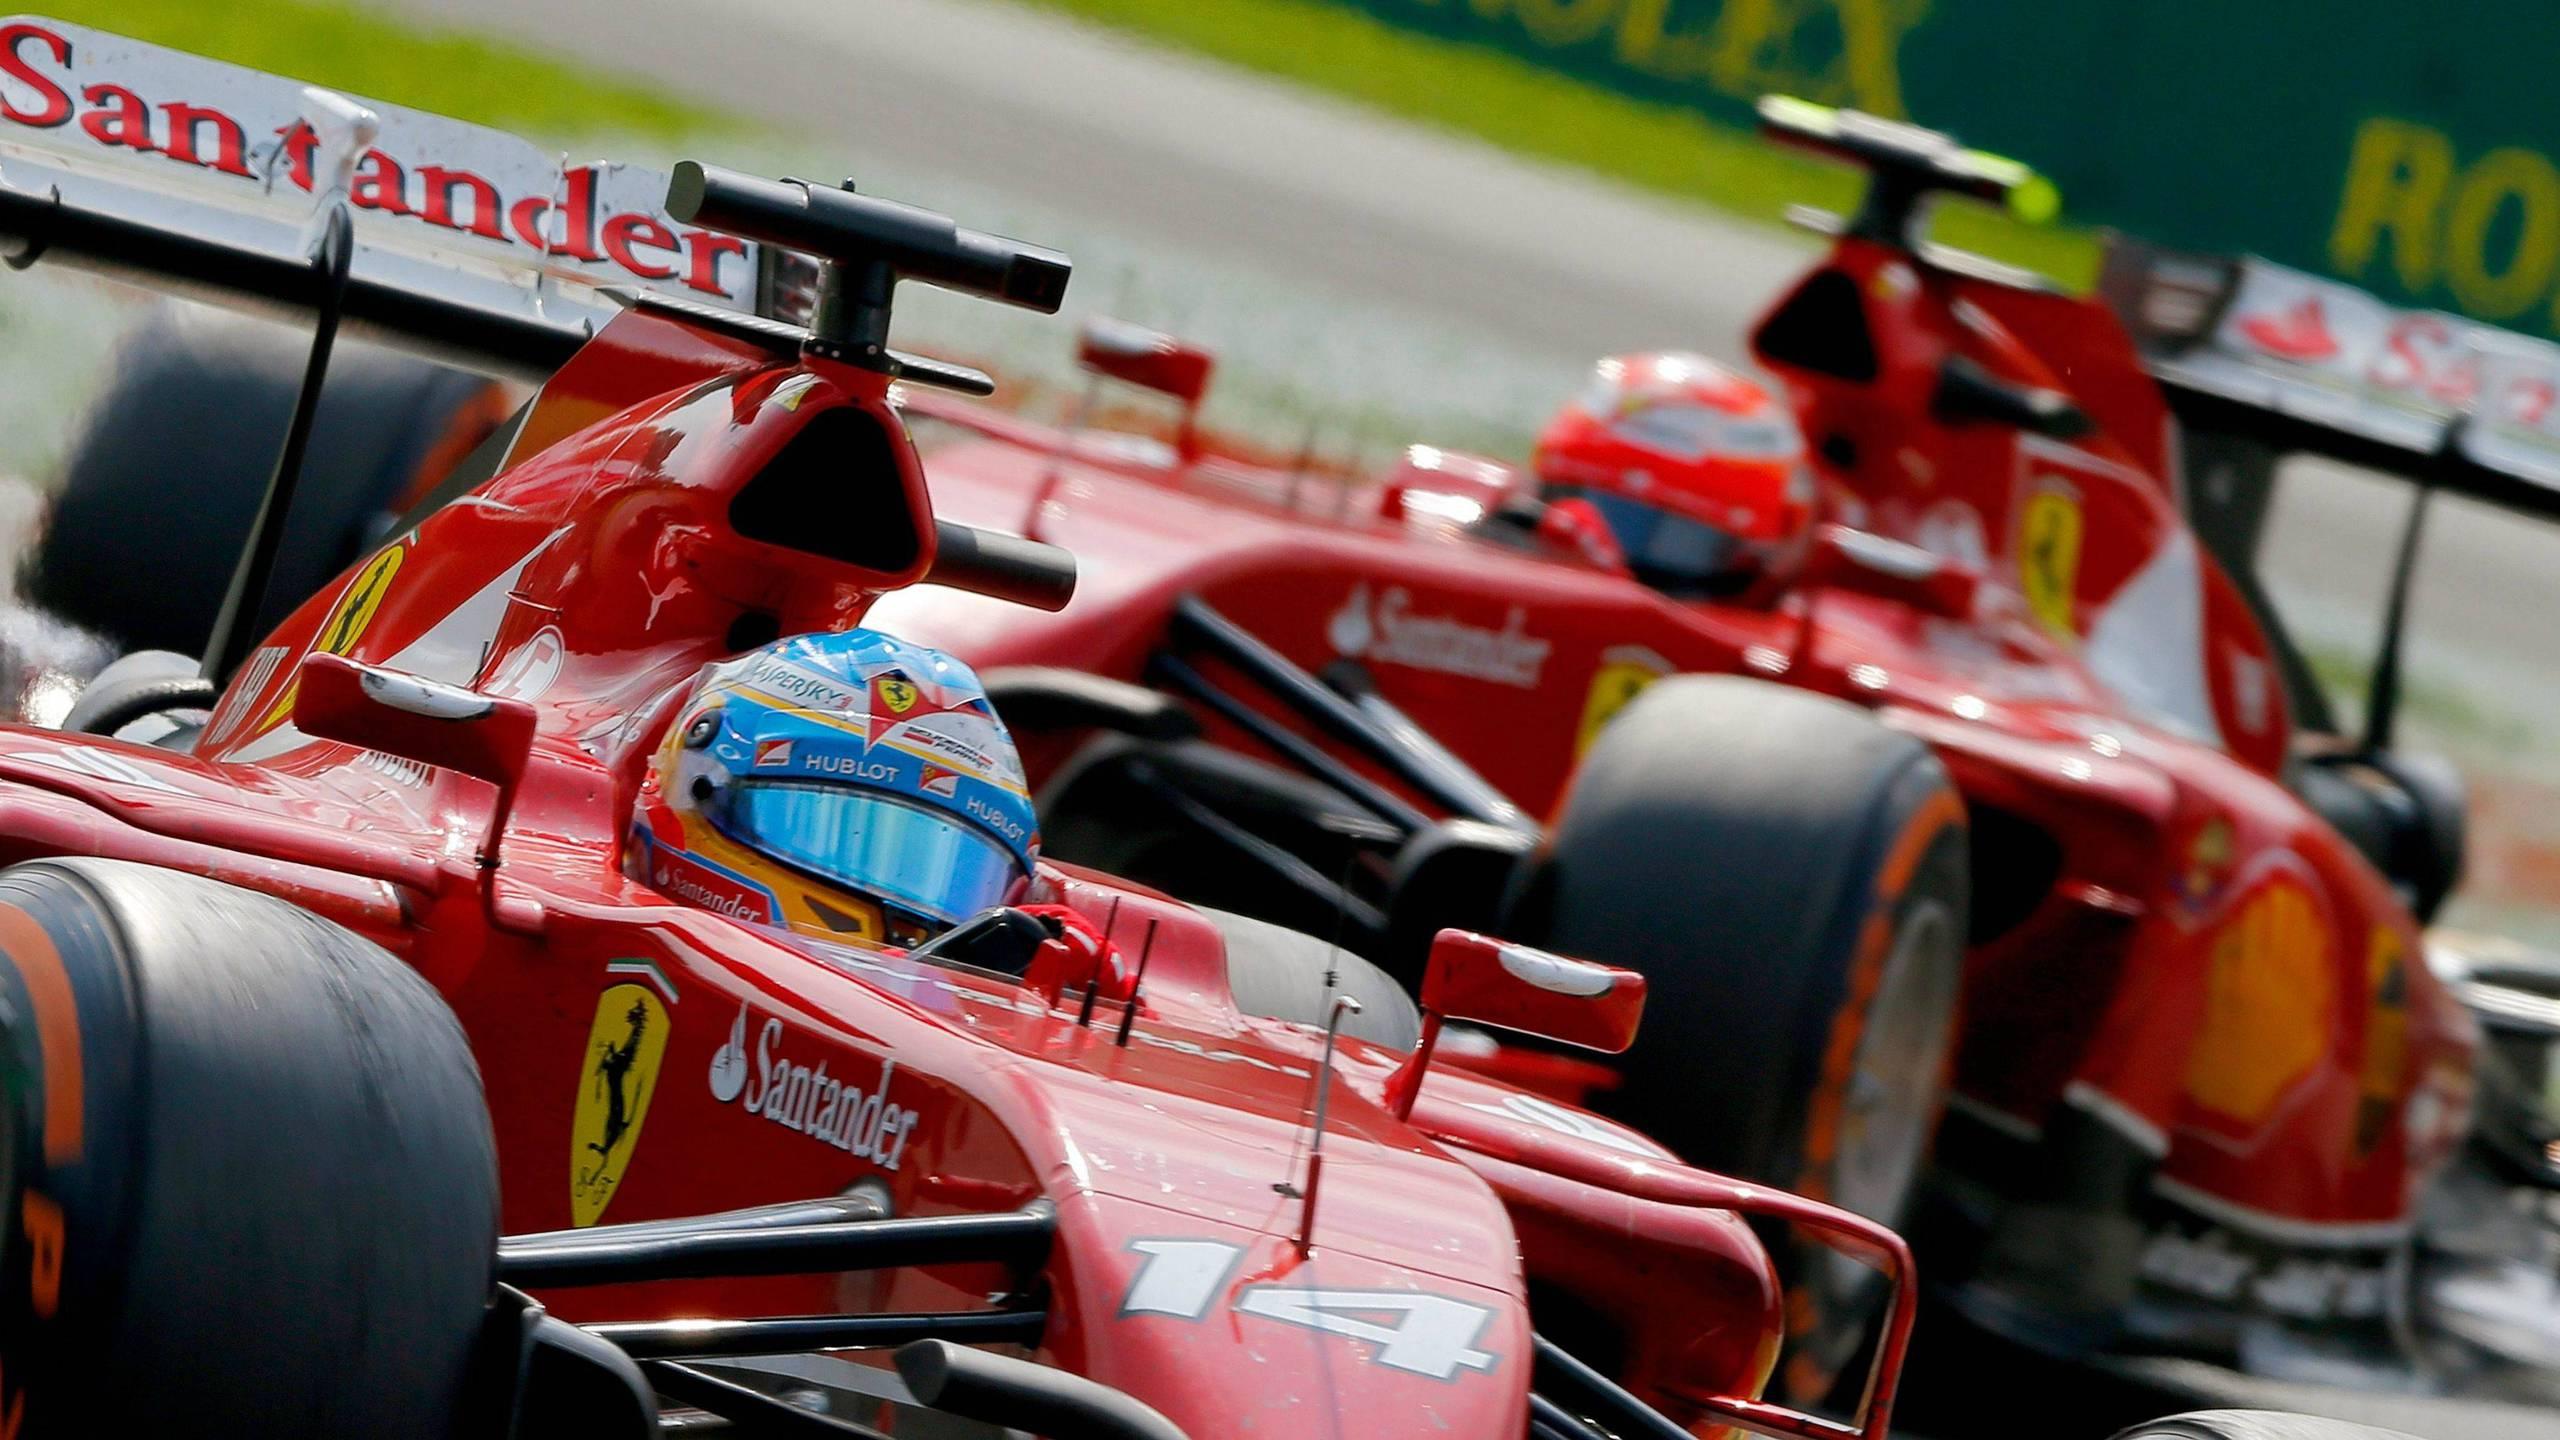 BOTPOST [BOTPOST] Alonso Rikknen   Ferrari F14 T   2014 Italian 2560x1440